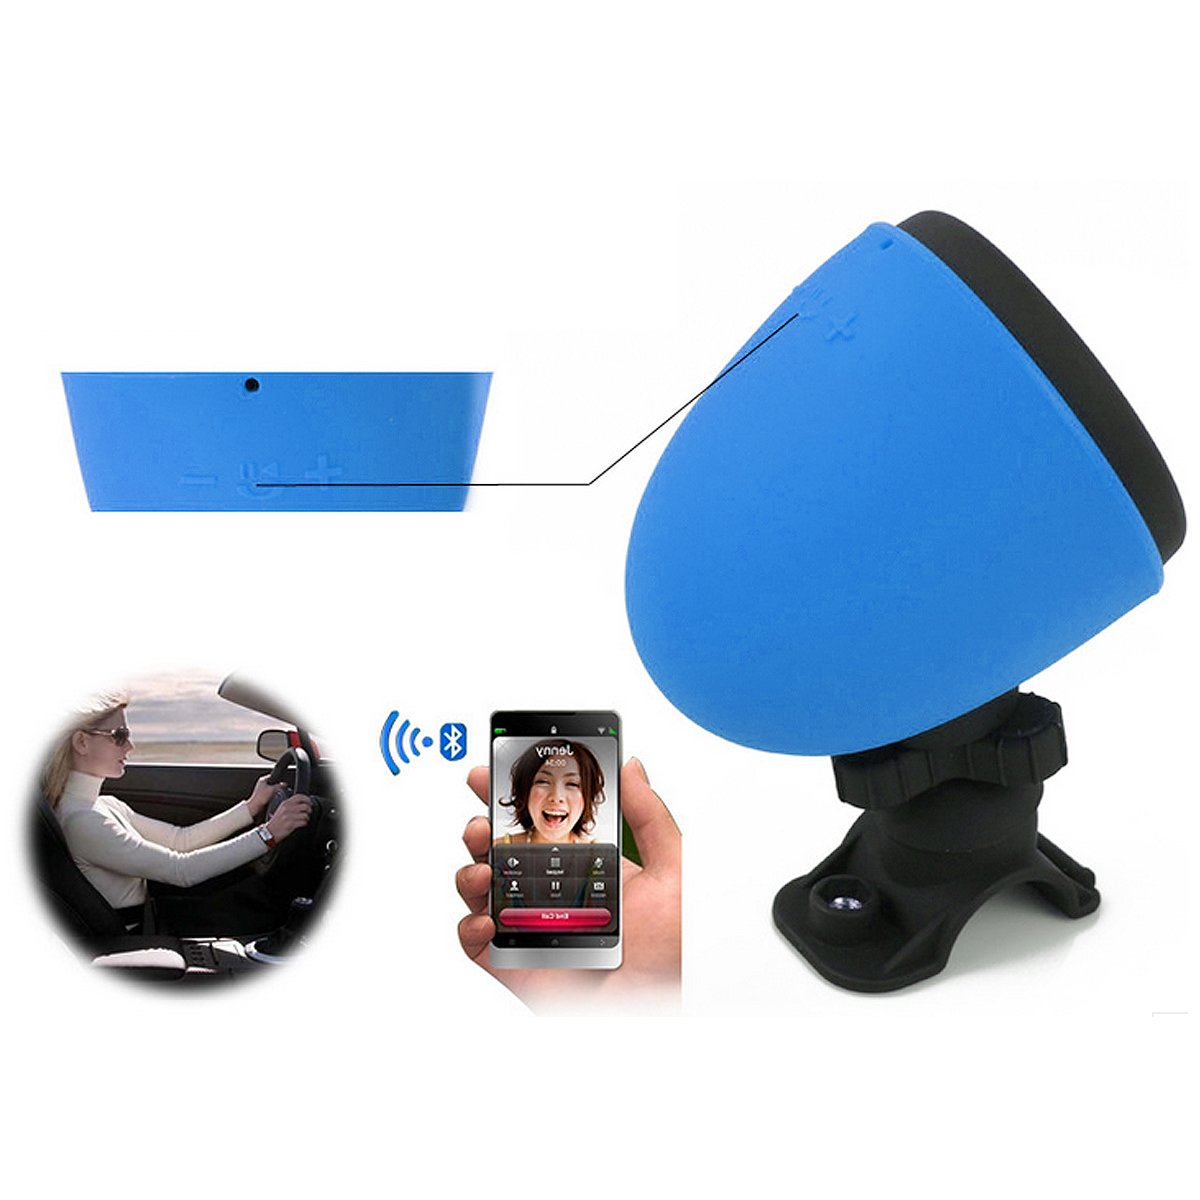 Sonlipo Bluetooth Waterproof Microphone Bicycling Image 3